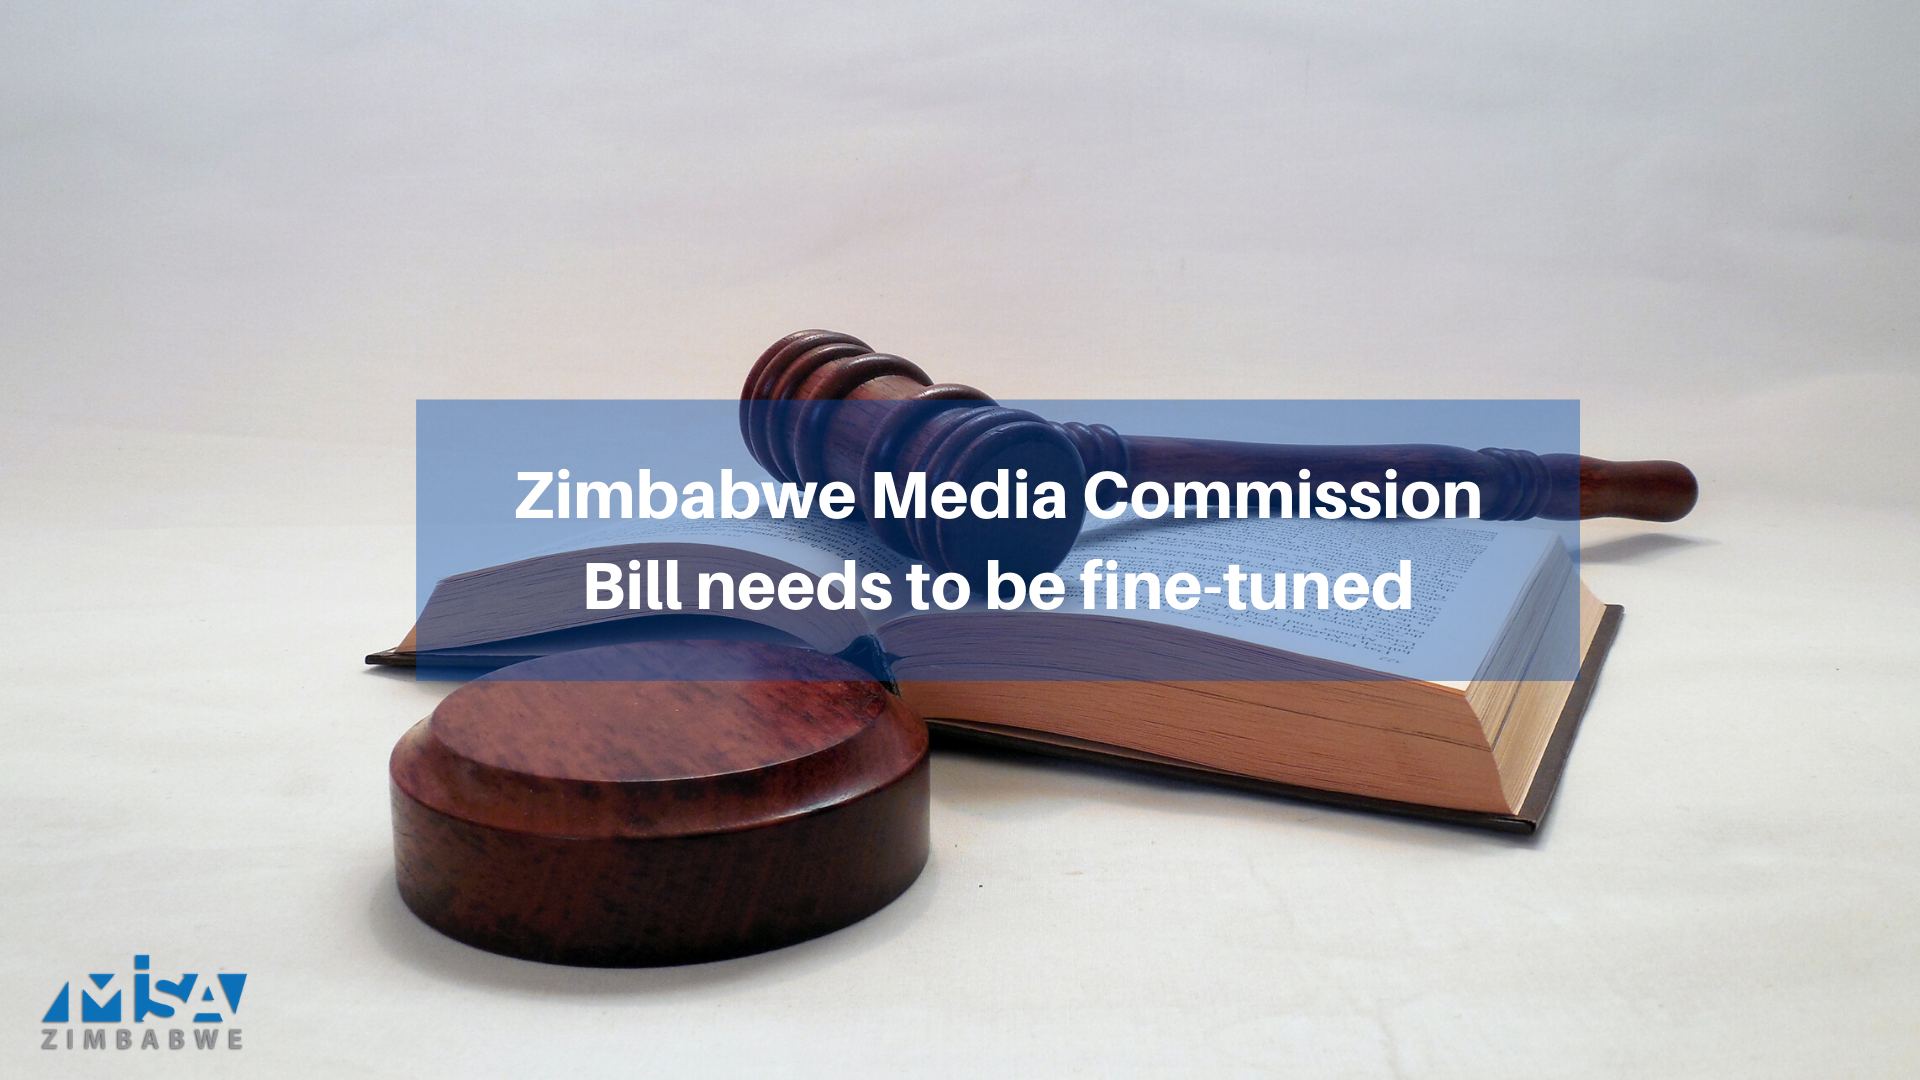 Zimbabwe Media Commission Bill needs to be fine-tuned